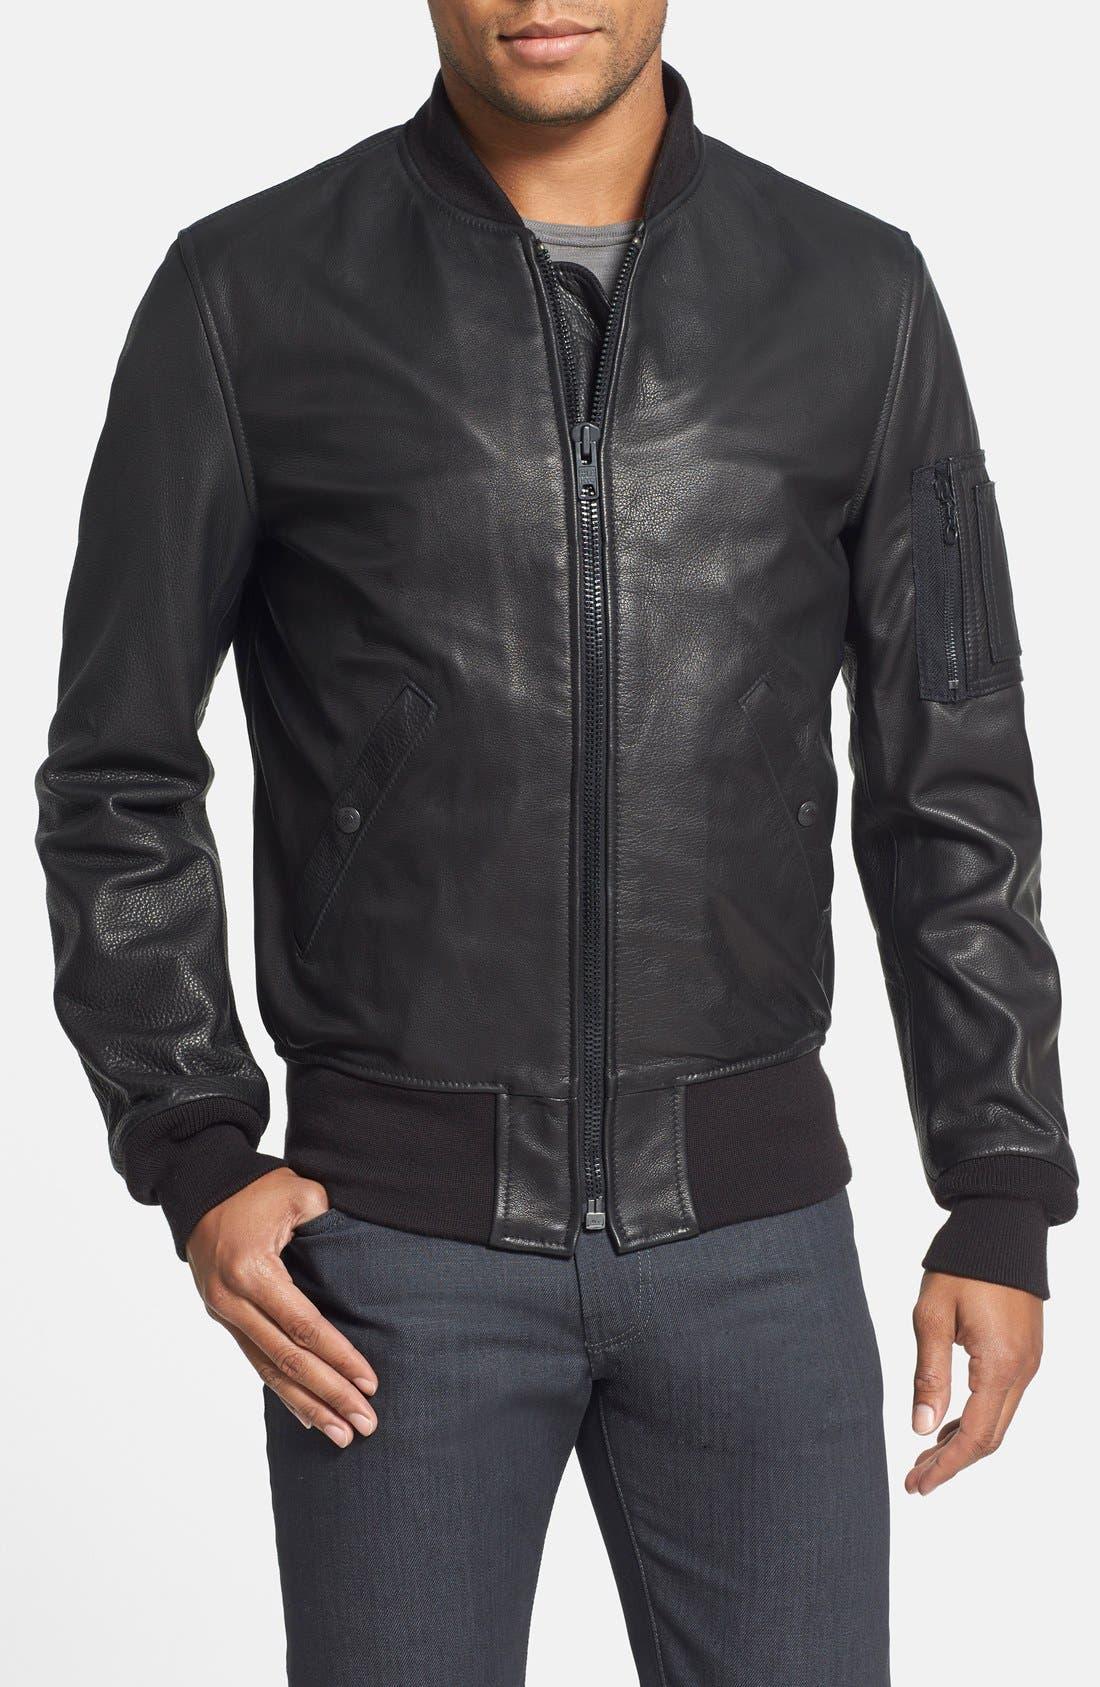 SCHOTT NYC MA-1 Slim Fit Leather Jacket